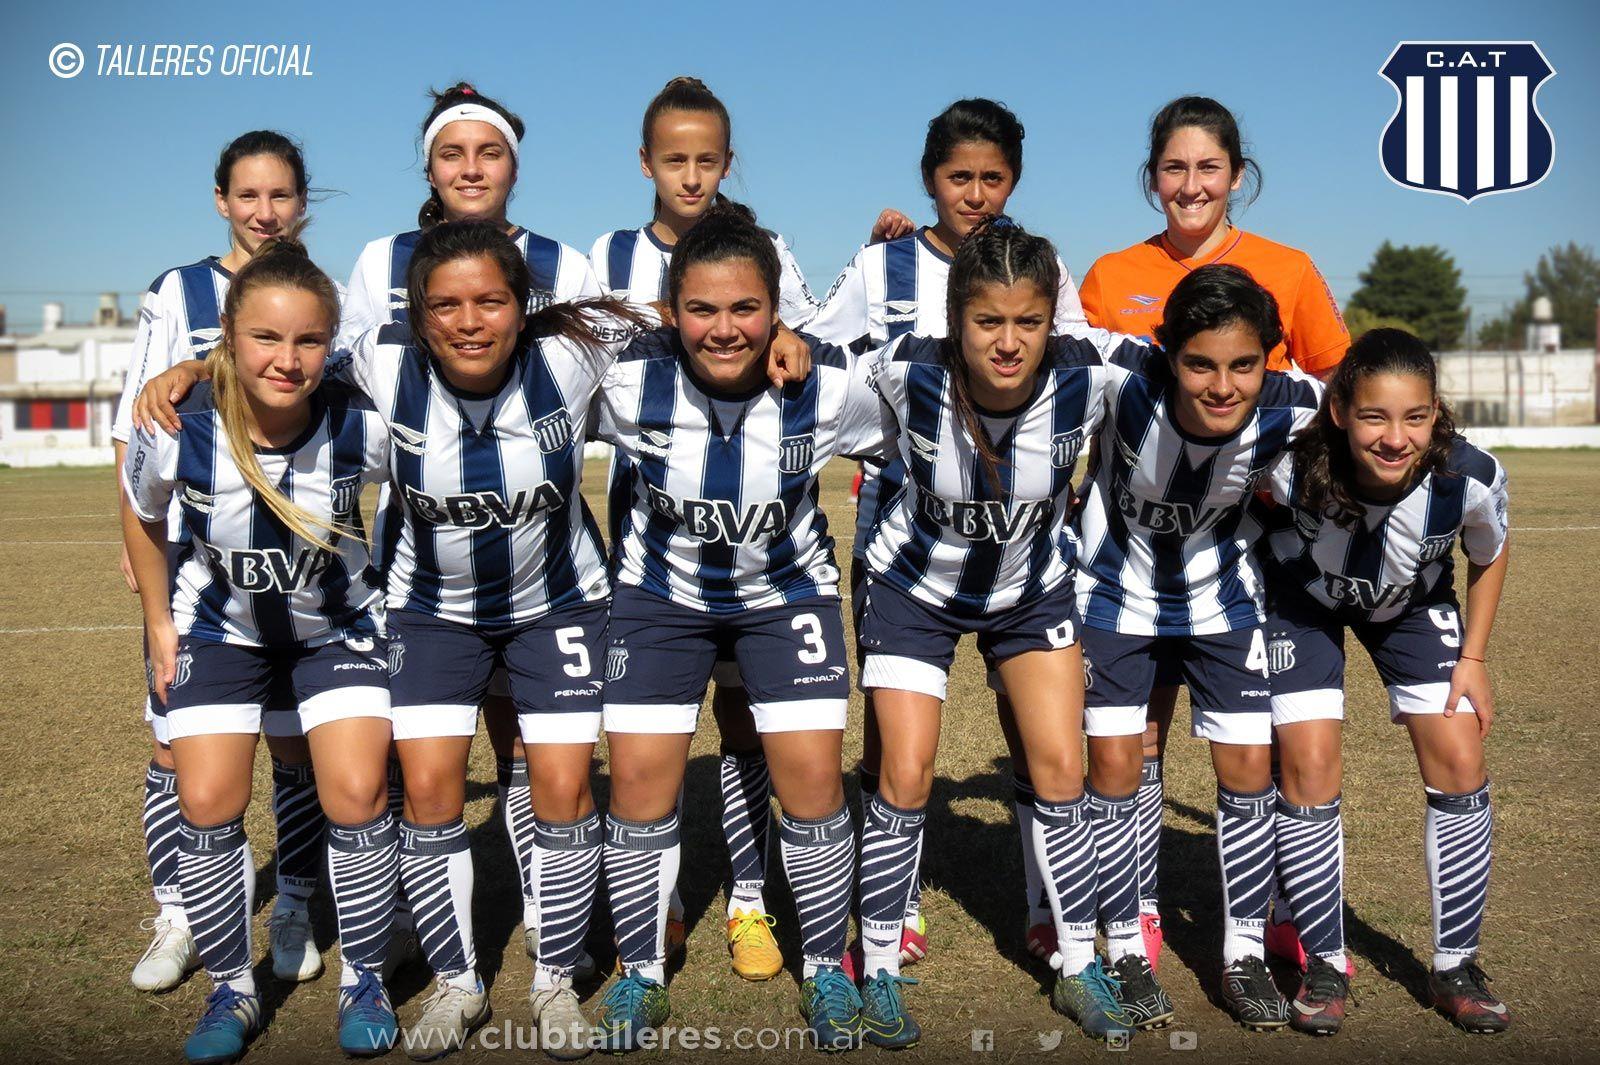 Soycat Talleres De Cordoba últimas Noticias Cuando Juega Futbol Femenino Talleres De Cordoba Club Atletico Talleres